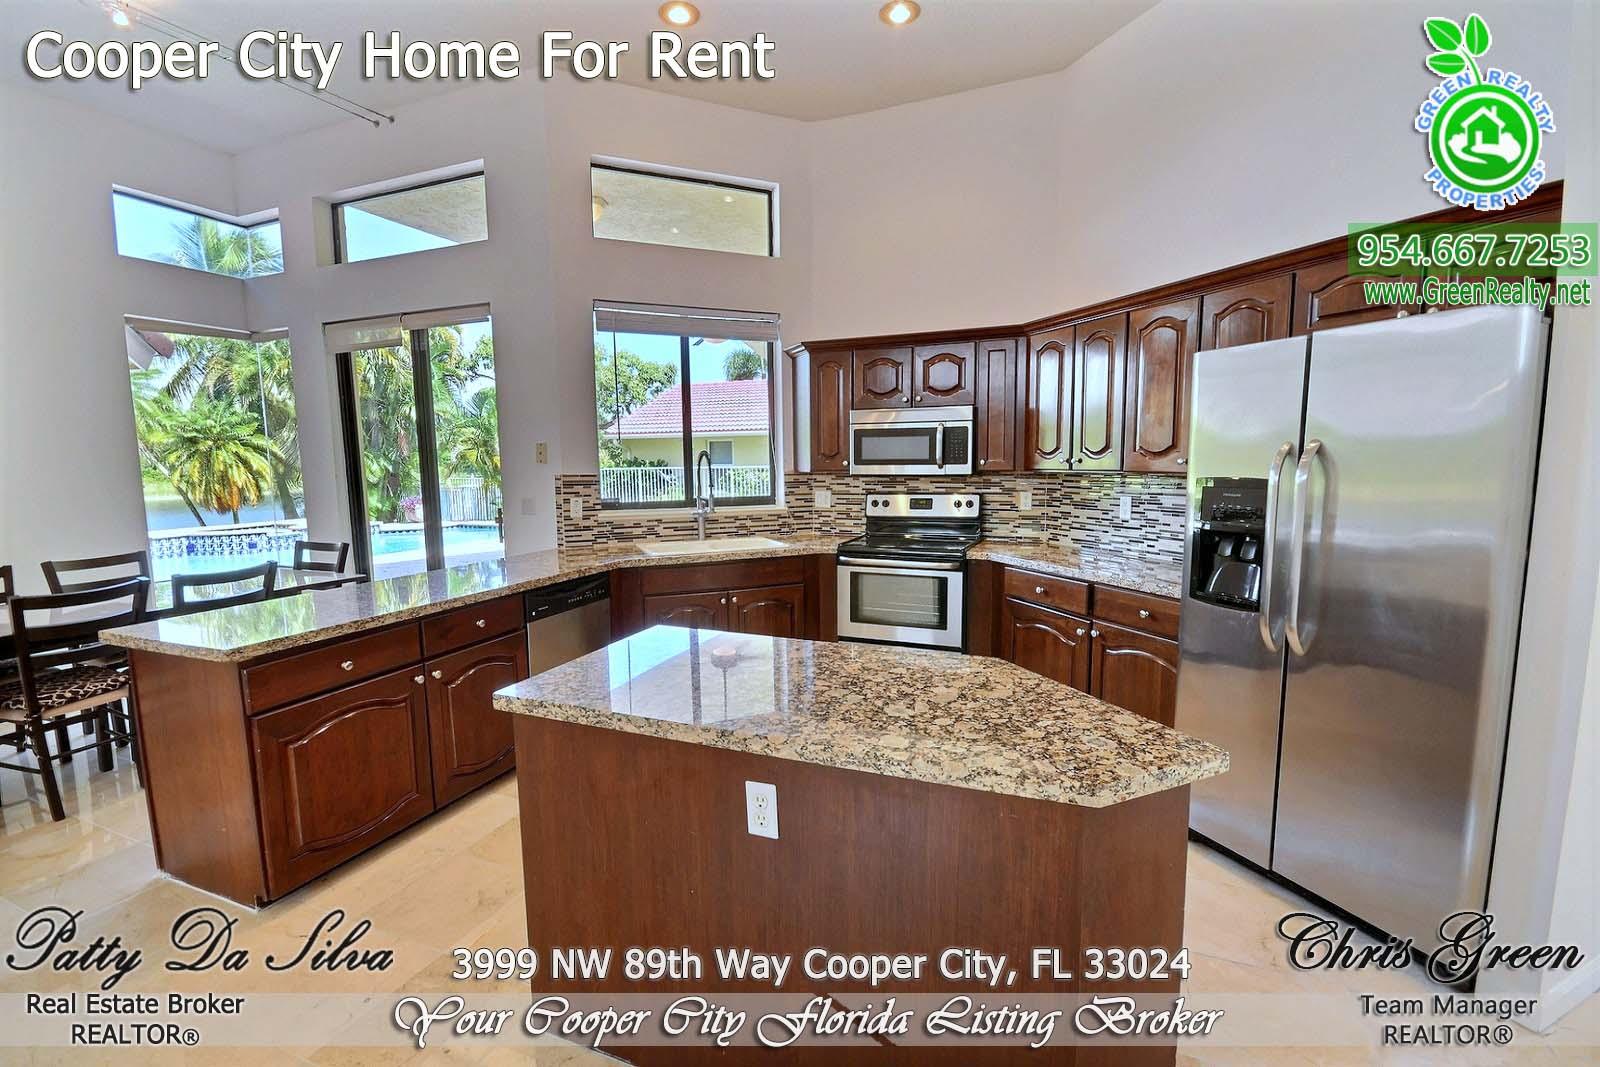 19 Cooper City Home Rentals (4)